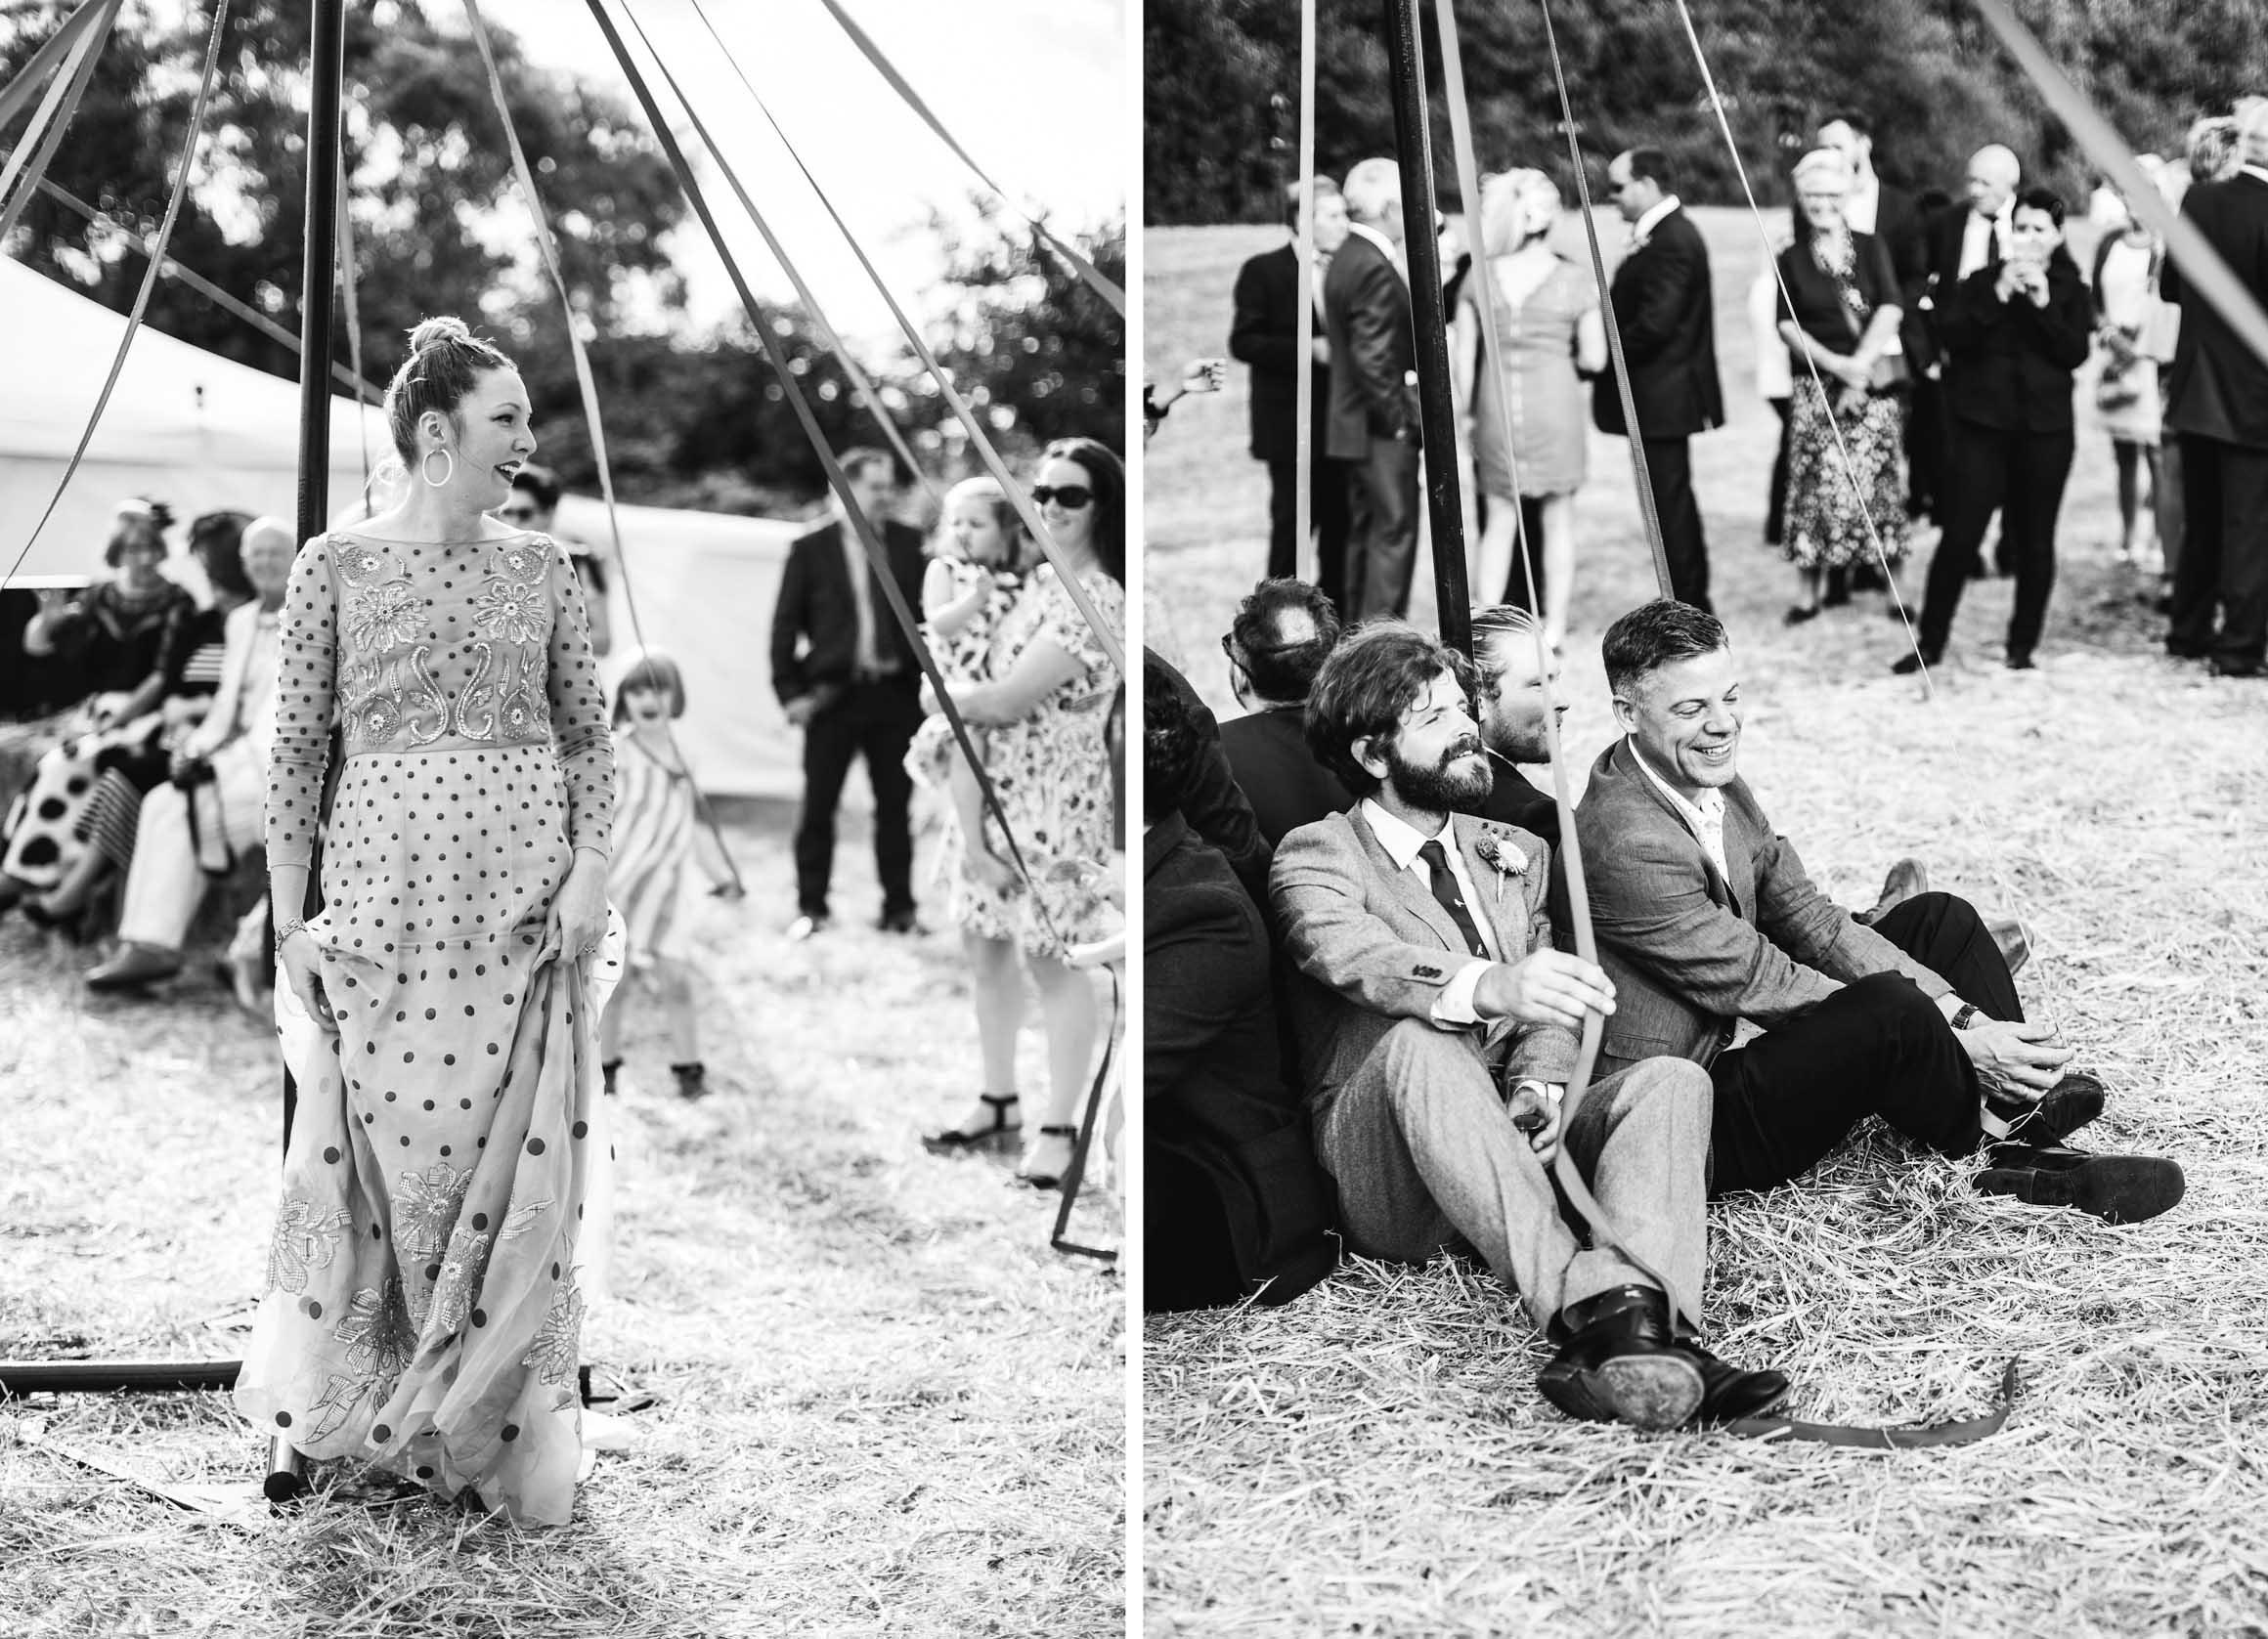 Amy O'Boyle Photography, Destination & UK Fine Art Film Wedding Photographer, DIY Carnival Farm Wedding with May Pole.jpg